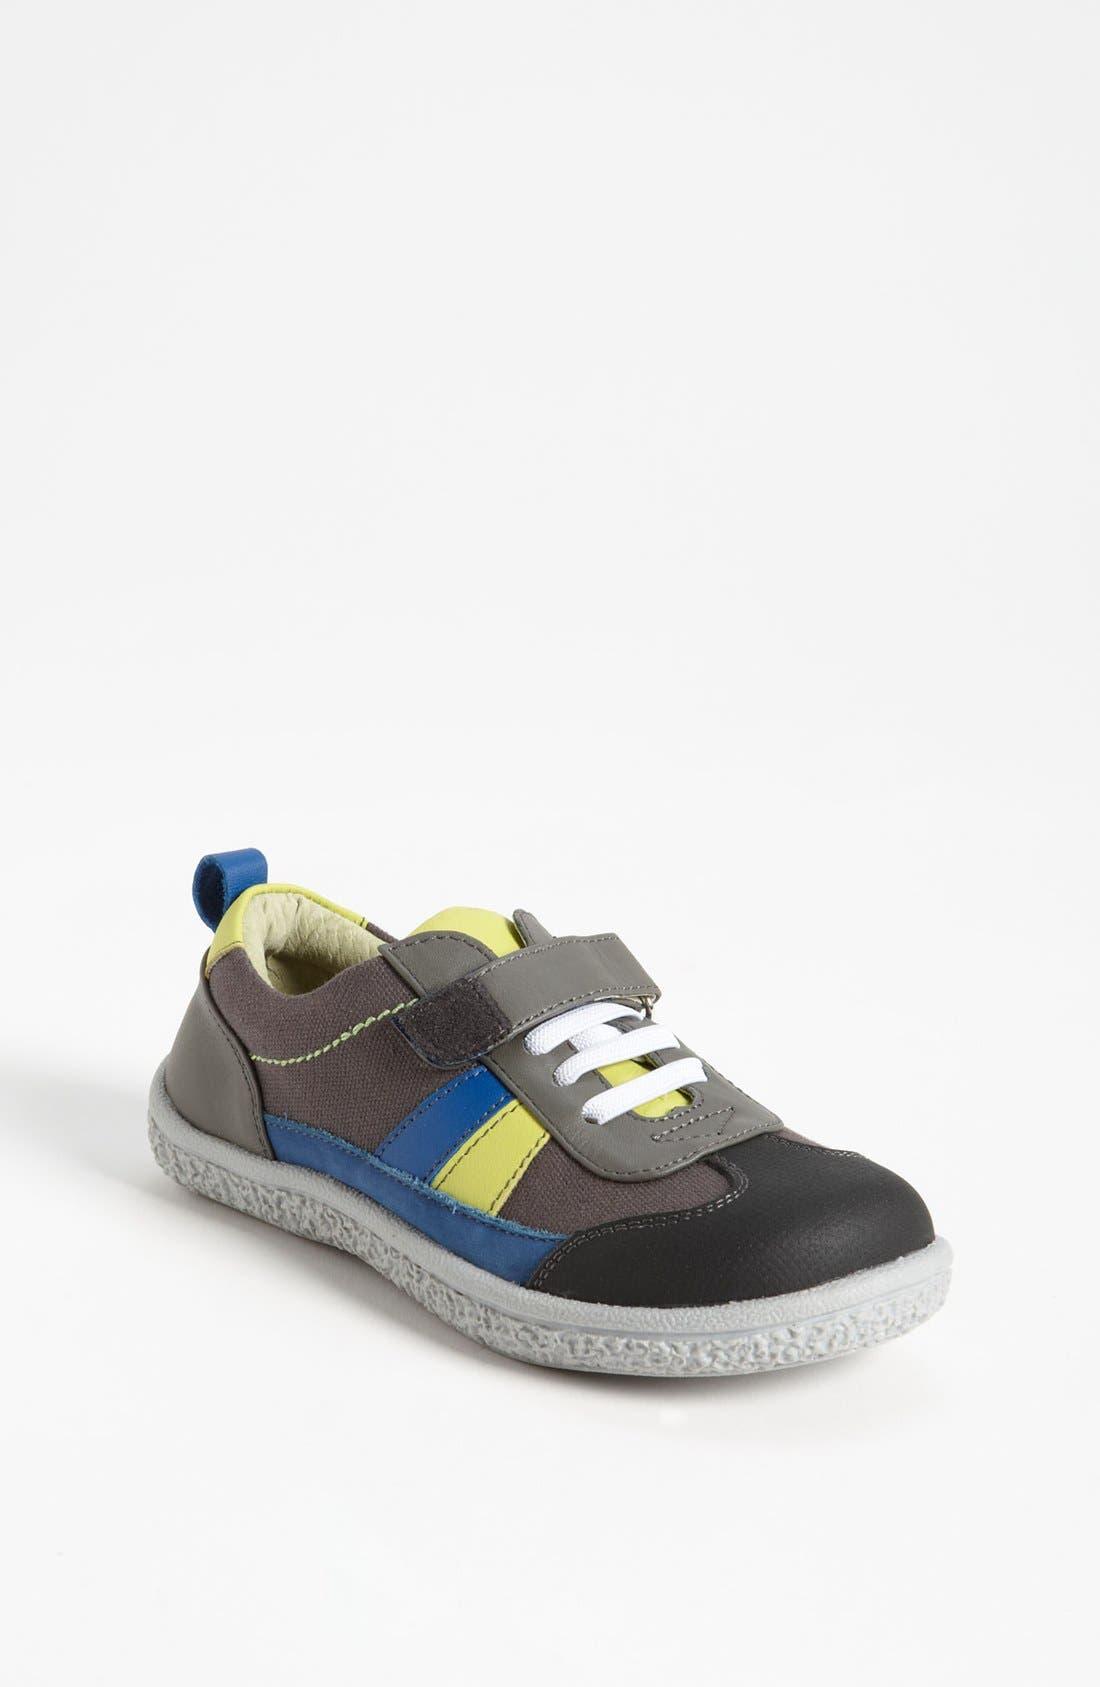 Alternate Image 1 Selected - See Kai Run 'Enzo' Sneaker (Toddler & Little Kid)